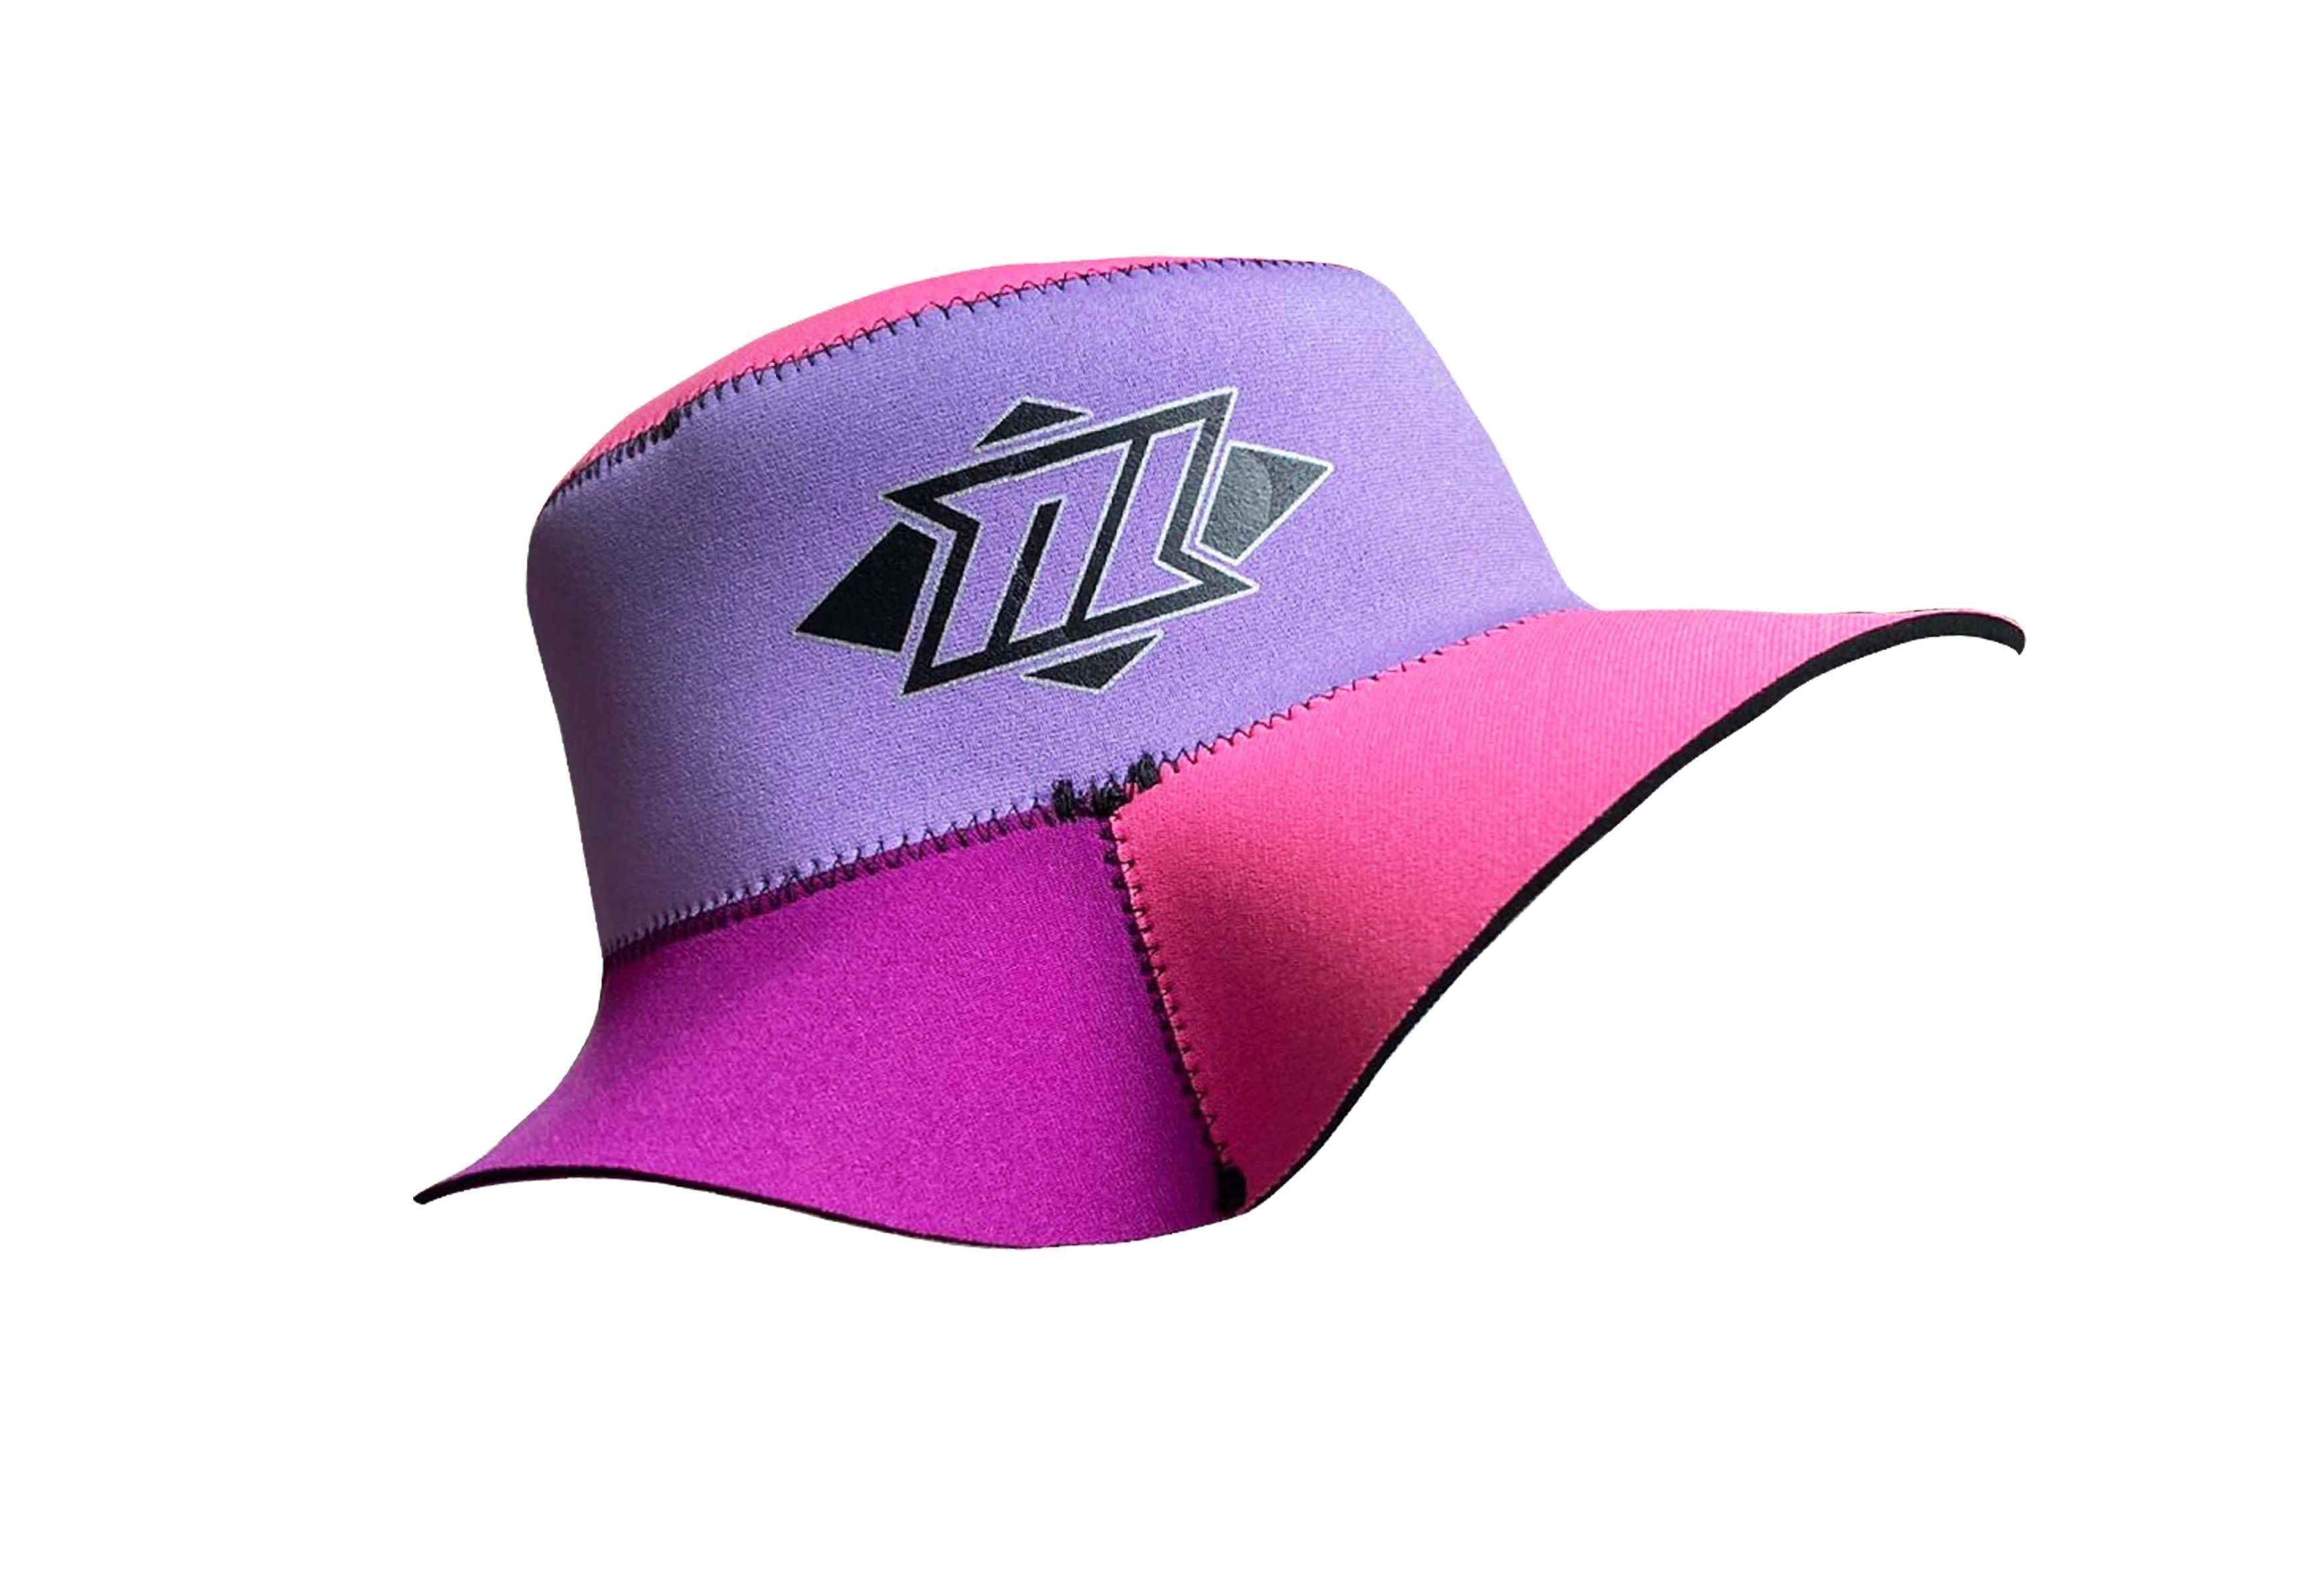 MAKE No Limit Neoprene Bucket Hat